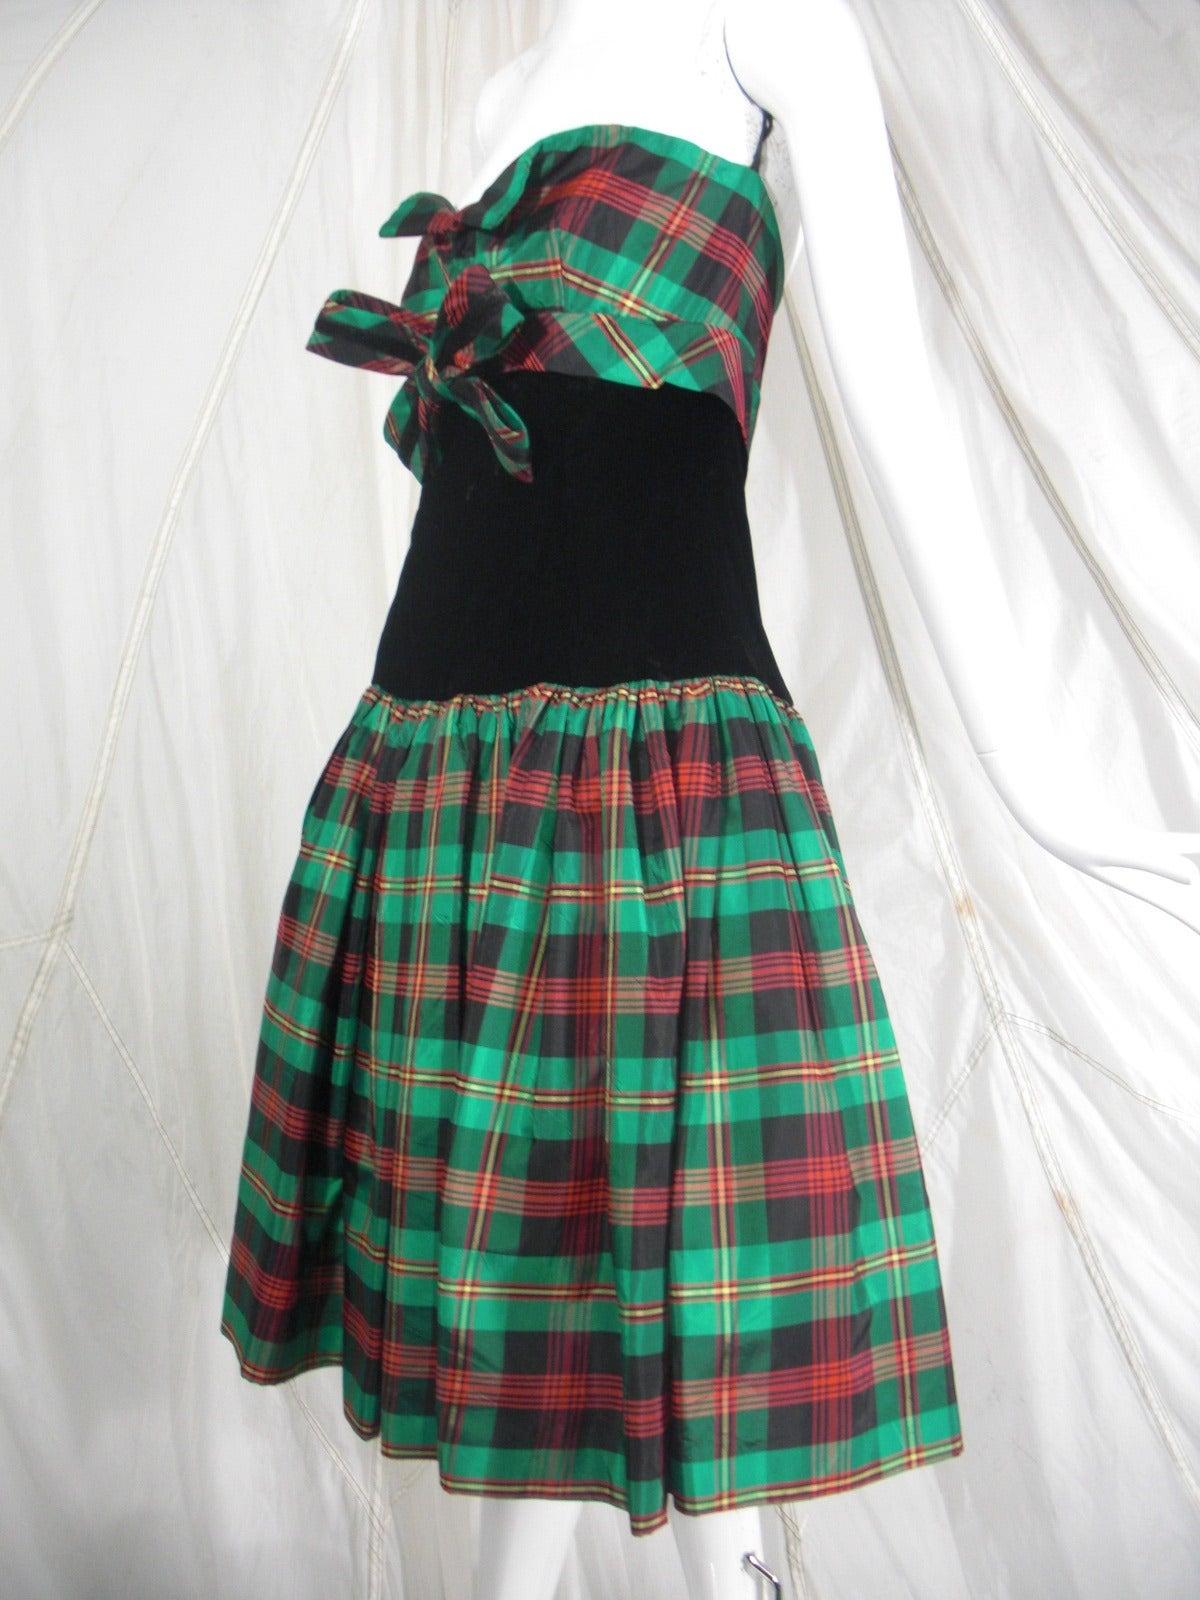 Victor Costa for SAKS 5th Avenue Green Plaid and Velvet Dress 4